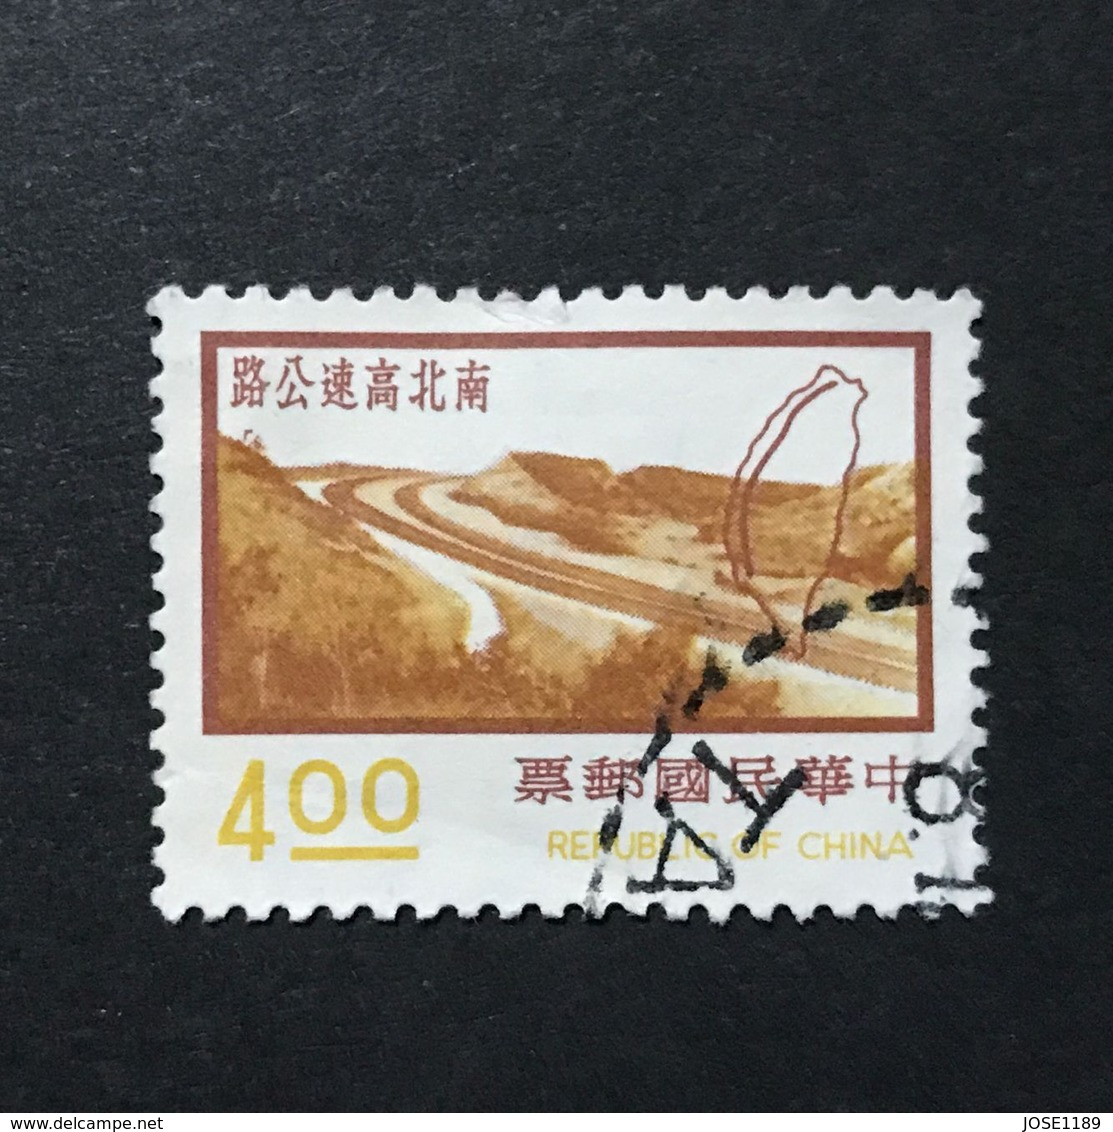 ◆◆◆Taiwán (Formosa)  1974  Taichung Harbor   $4   USED   AA2316 - 1945-... República De China